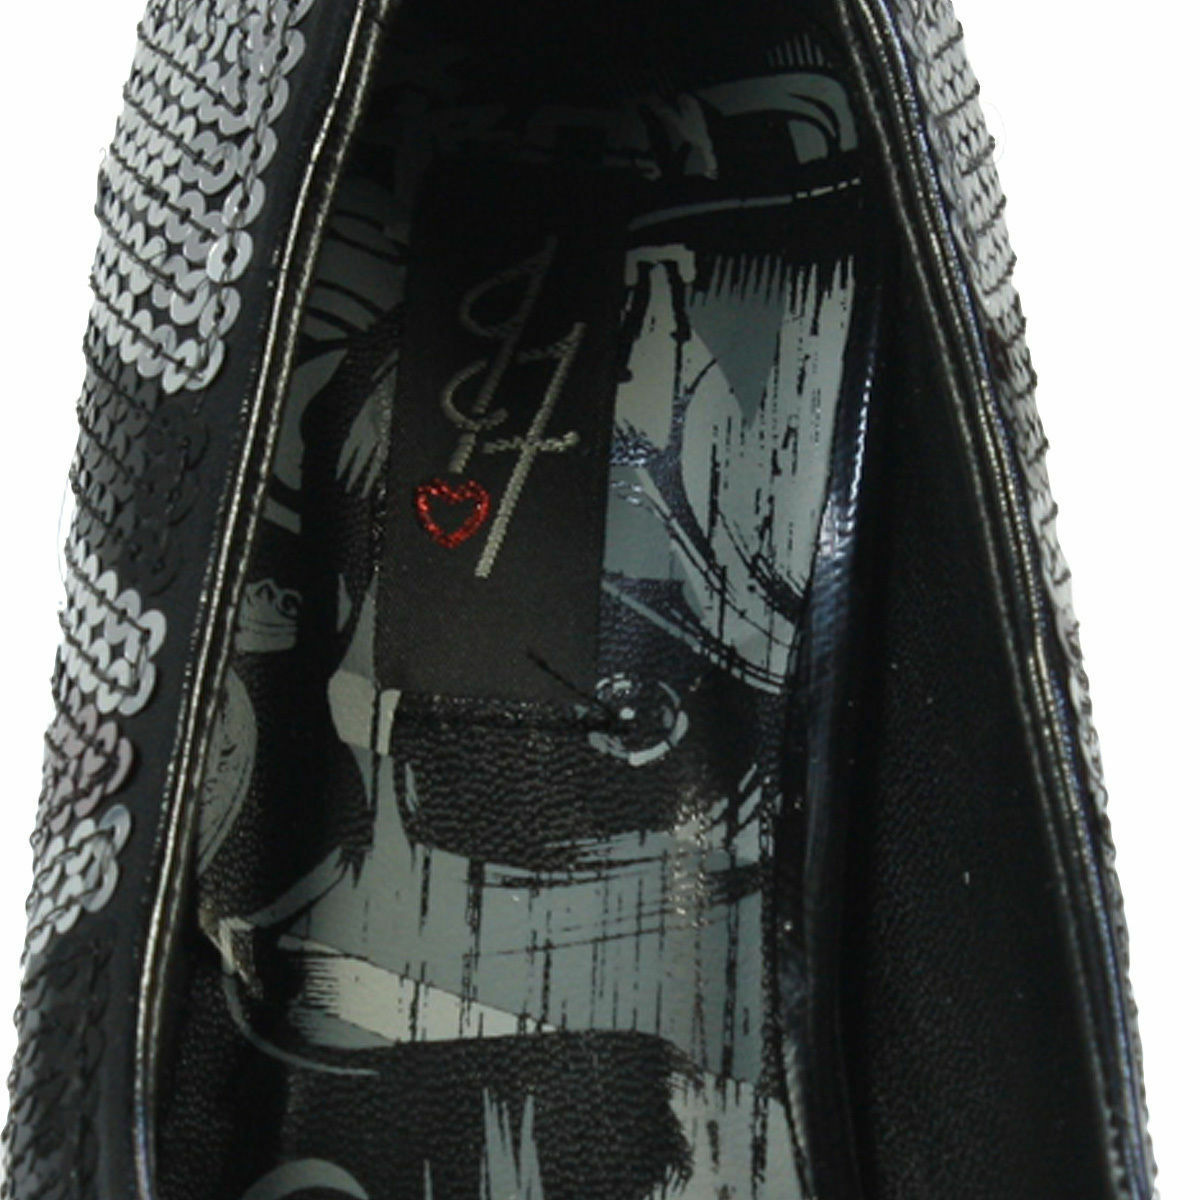 Iron Fist Abbey Dawn Avril Lavigne Jacked Jack Up Platform Pewter Union Jack Jacked Heels 7f188a